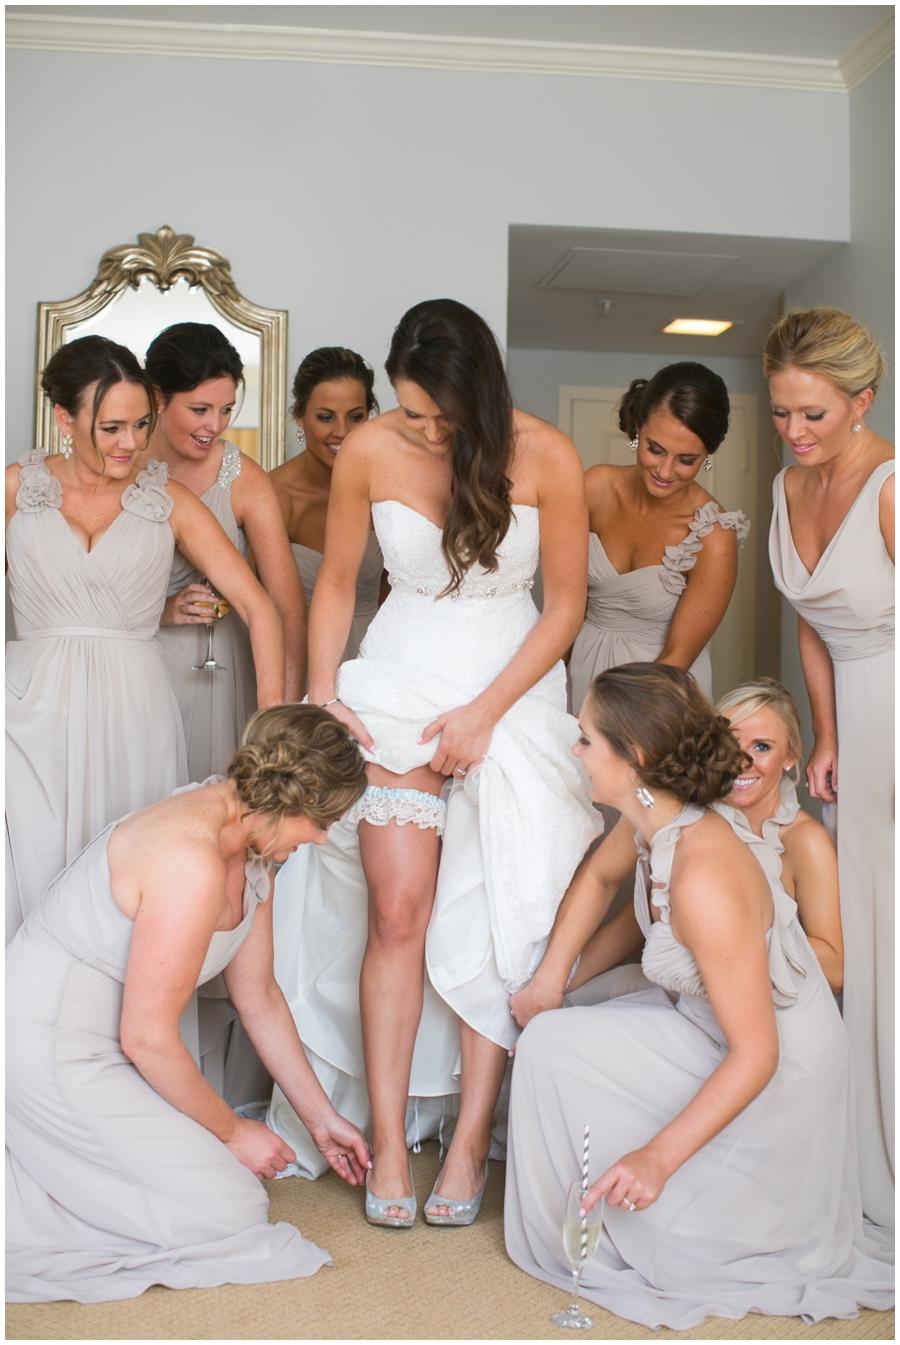 Chic Tidewater Inn Wedding Photographer - Easton Wedding Photography